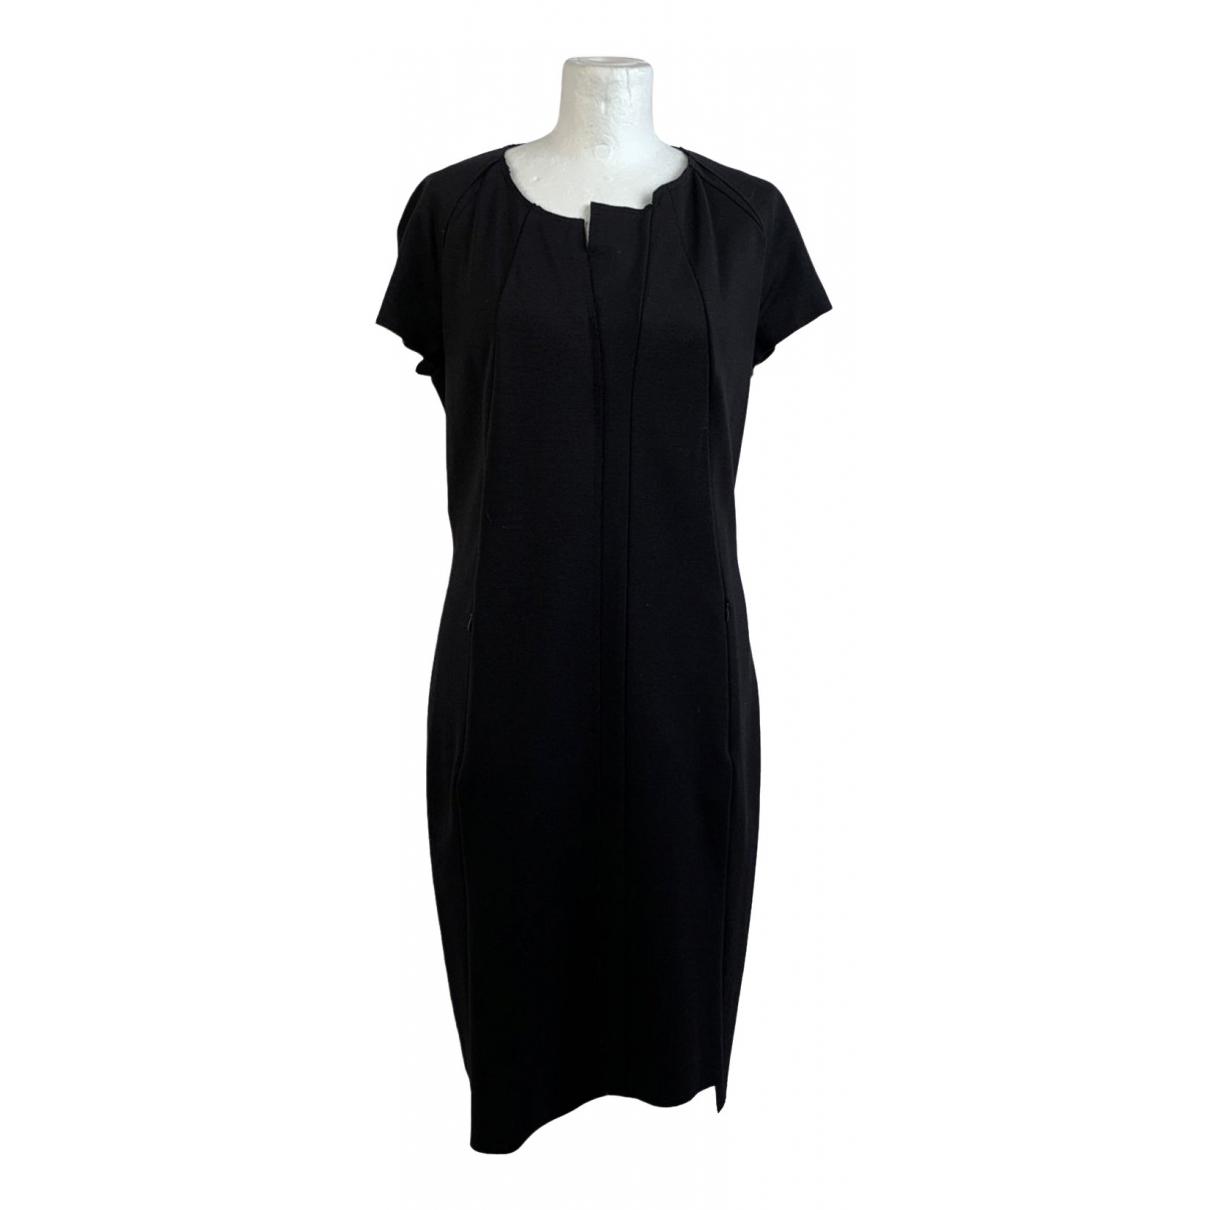 Jil Sander \N Black Wool dress for Women S International